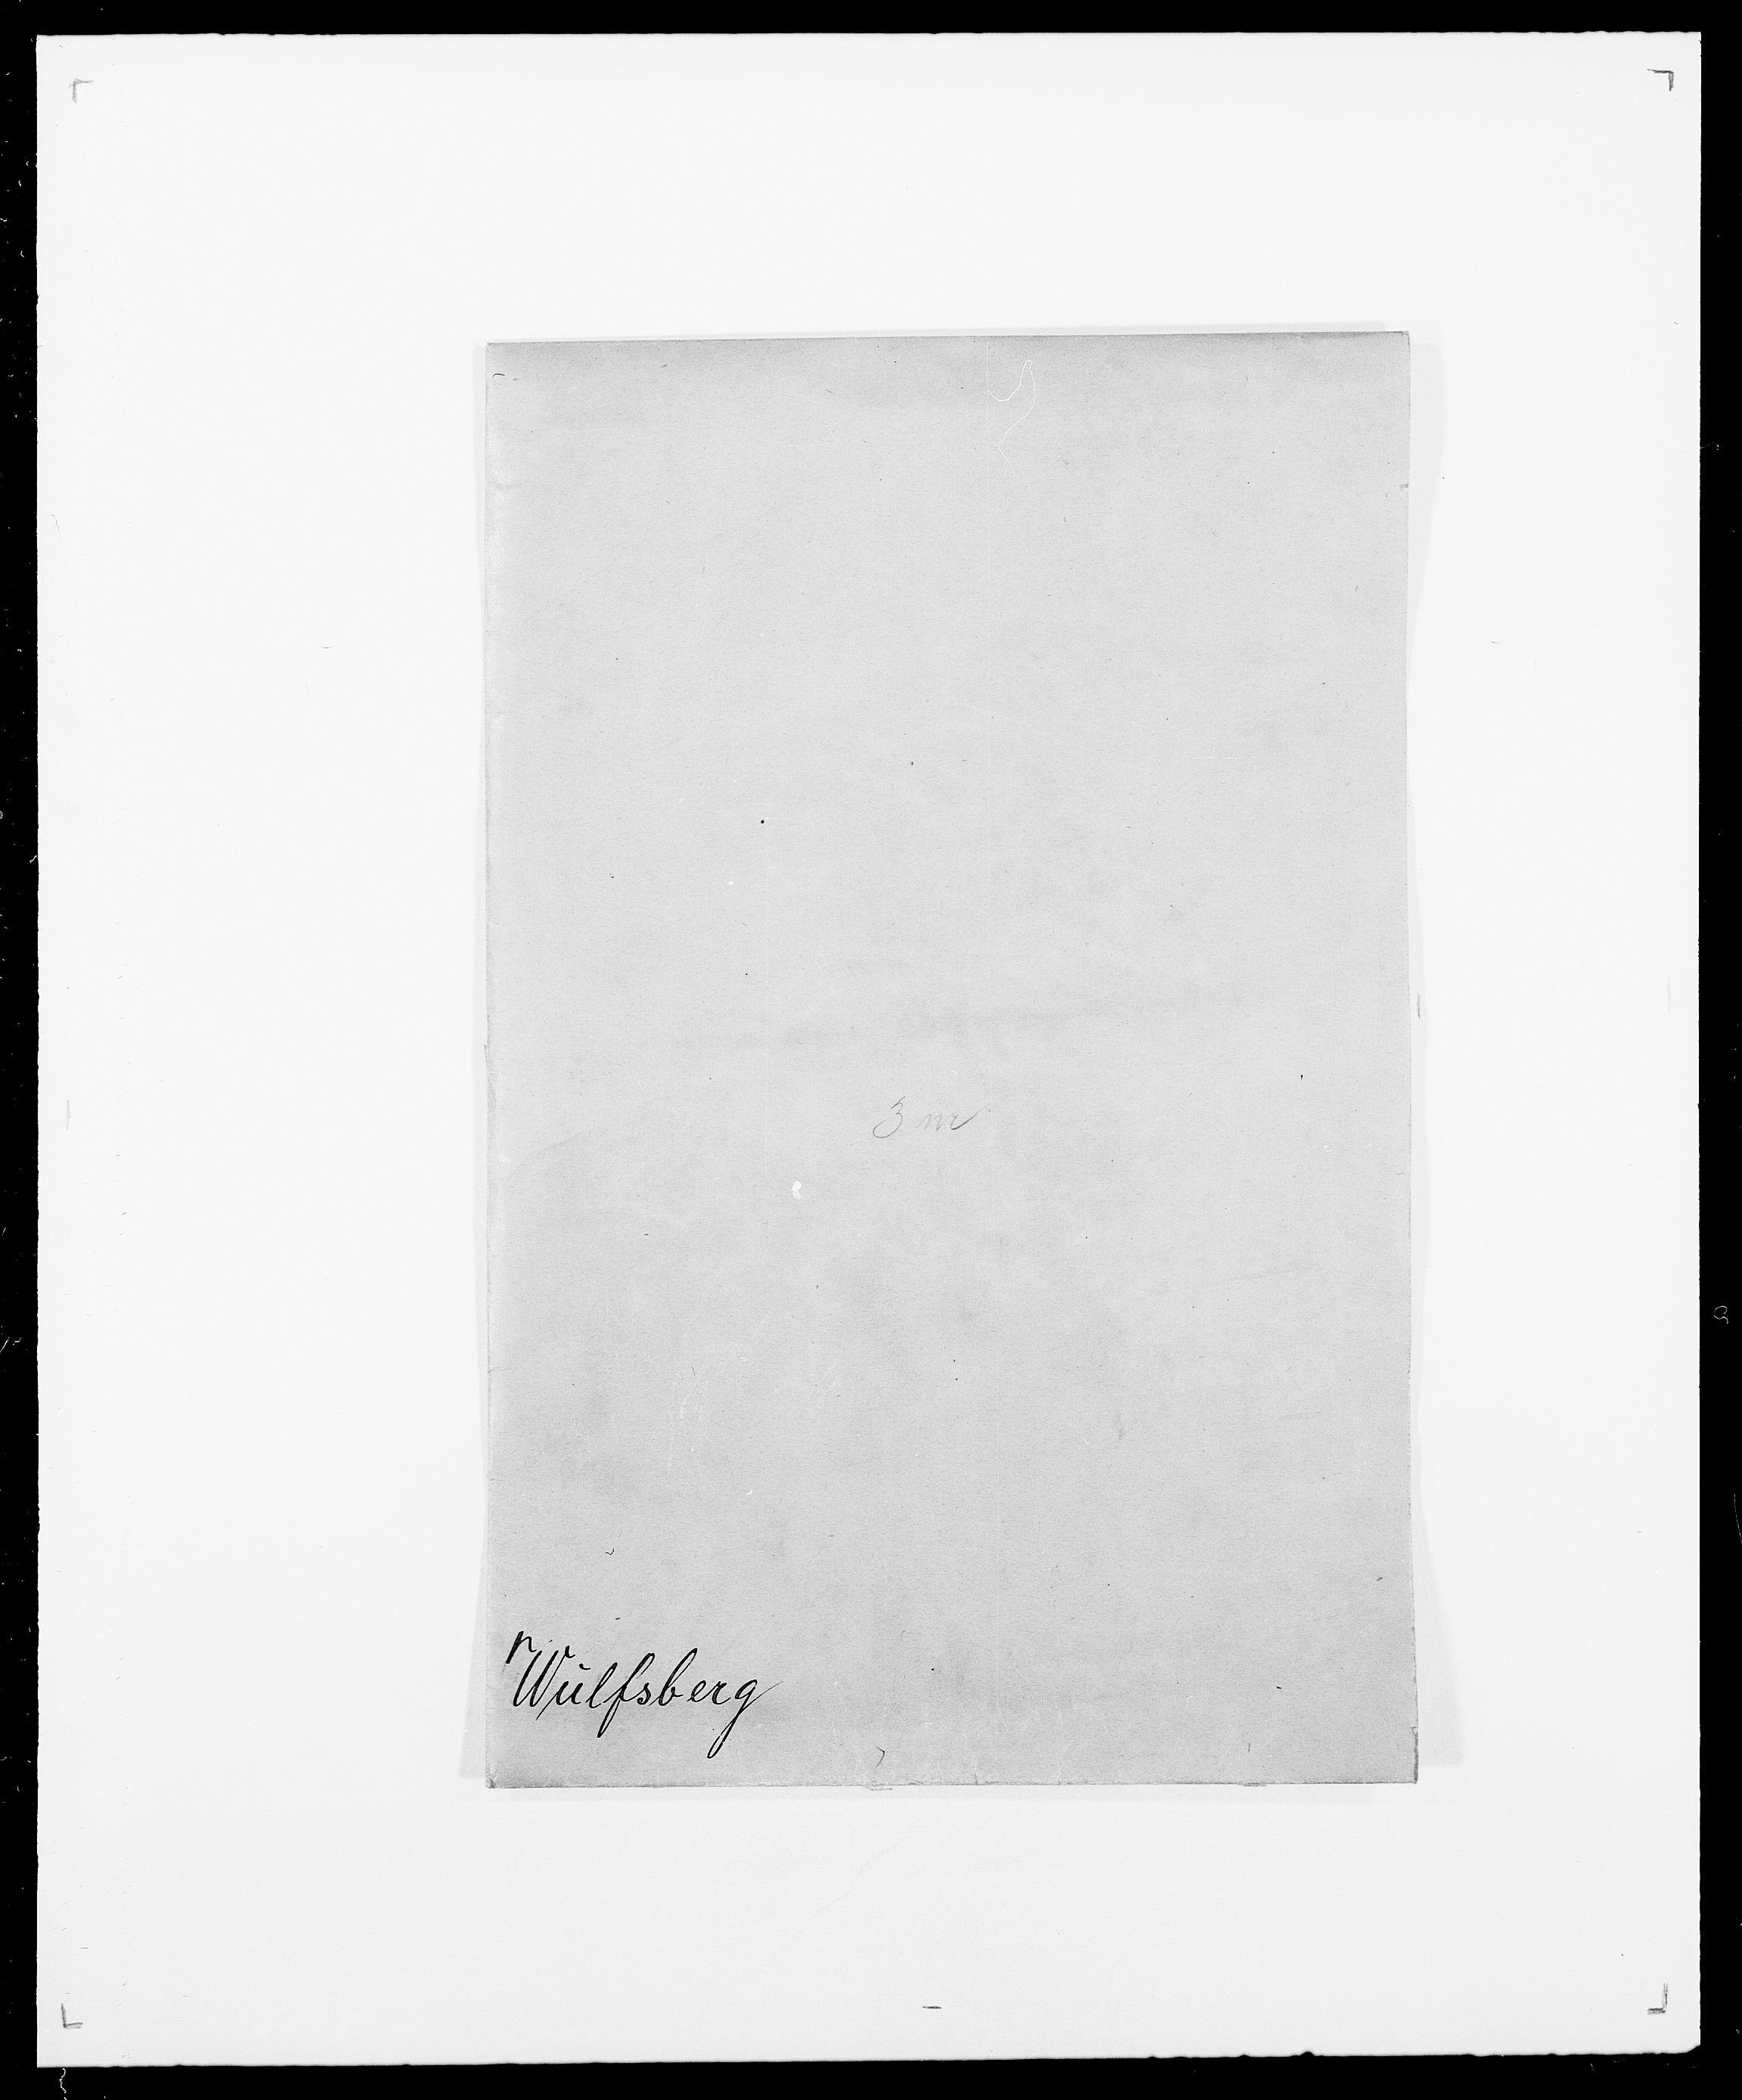 SAO, Delgobe, Charles Antoine - samling, D/Da/L0043: Wulfsberg - v. Zanten, s. 1